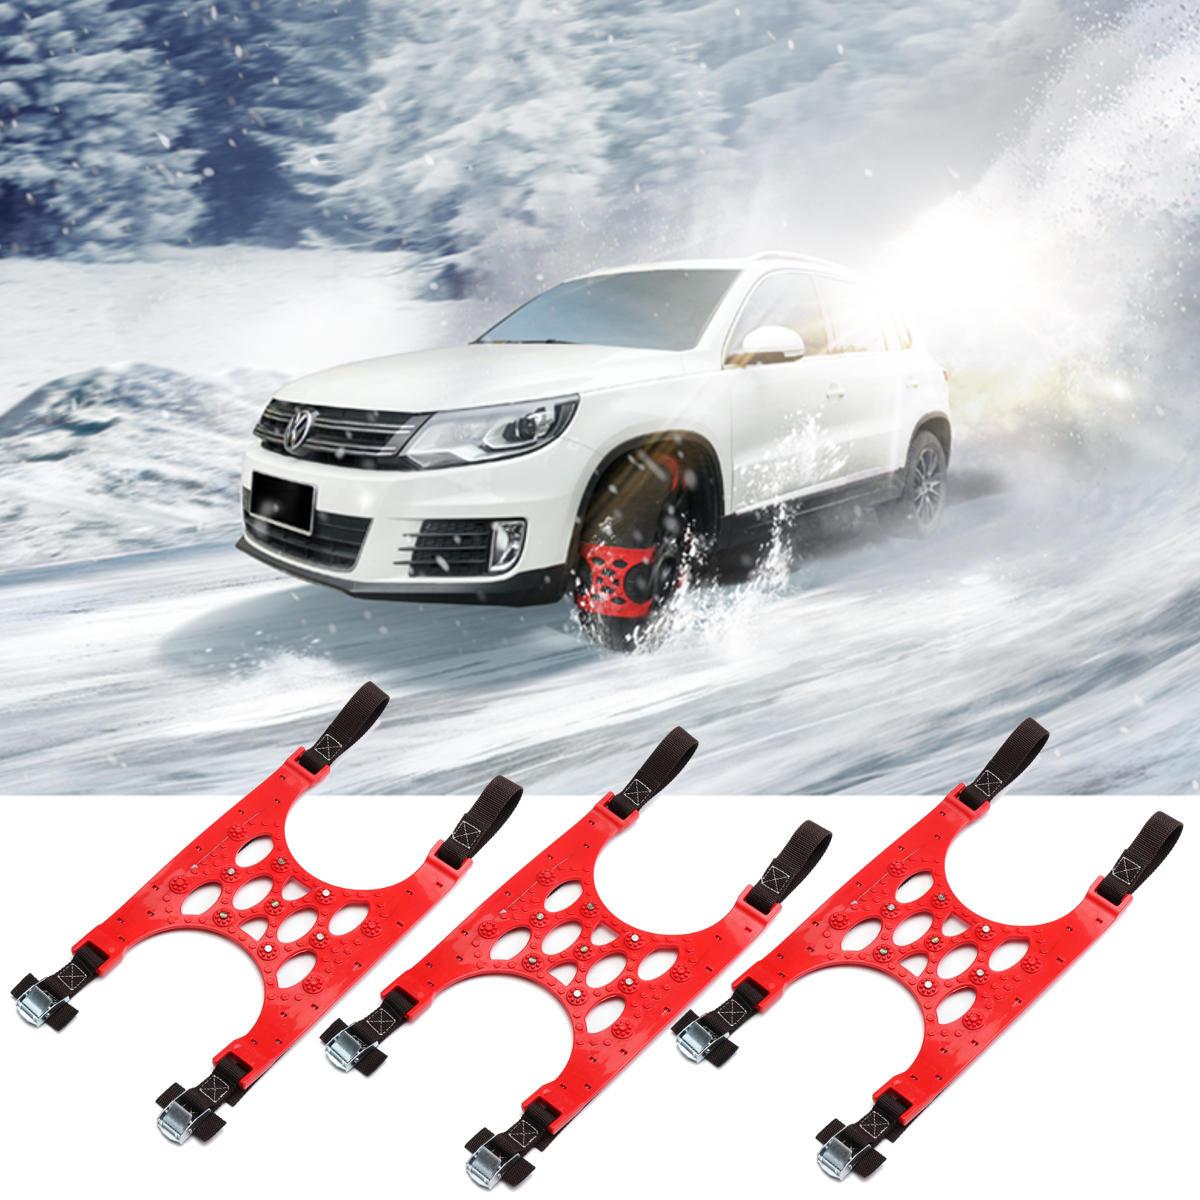 TPU यूनिवर्सल कार टायर स्टील वायर स्नो चेन सूट 165-265 मिमी सभी स्टील अर्द्ध स्टील विरोधी पर्ची सर्दियो